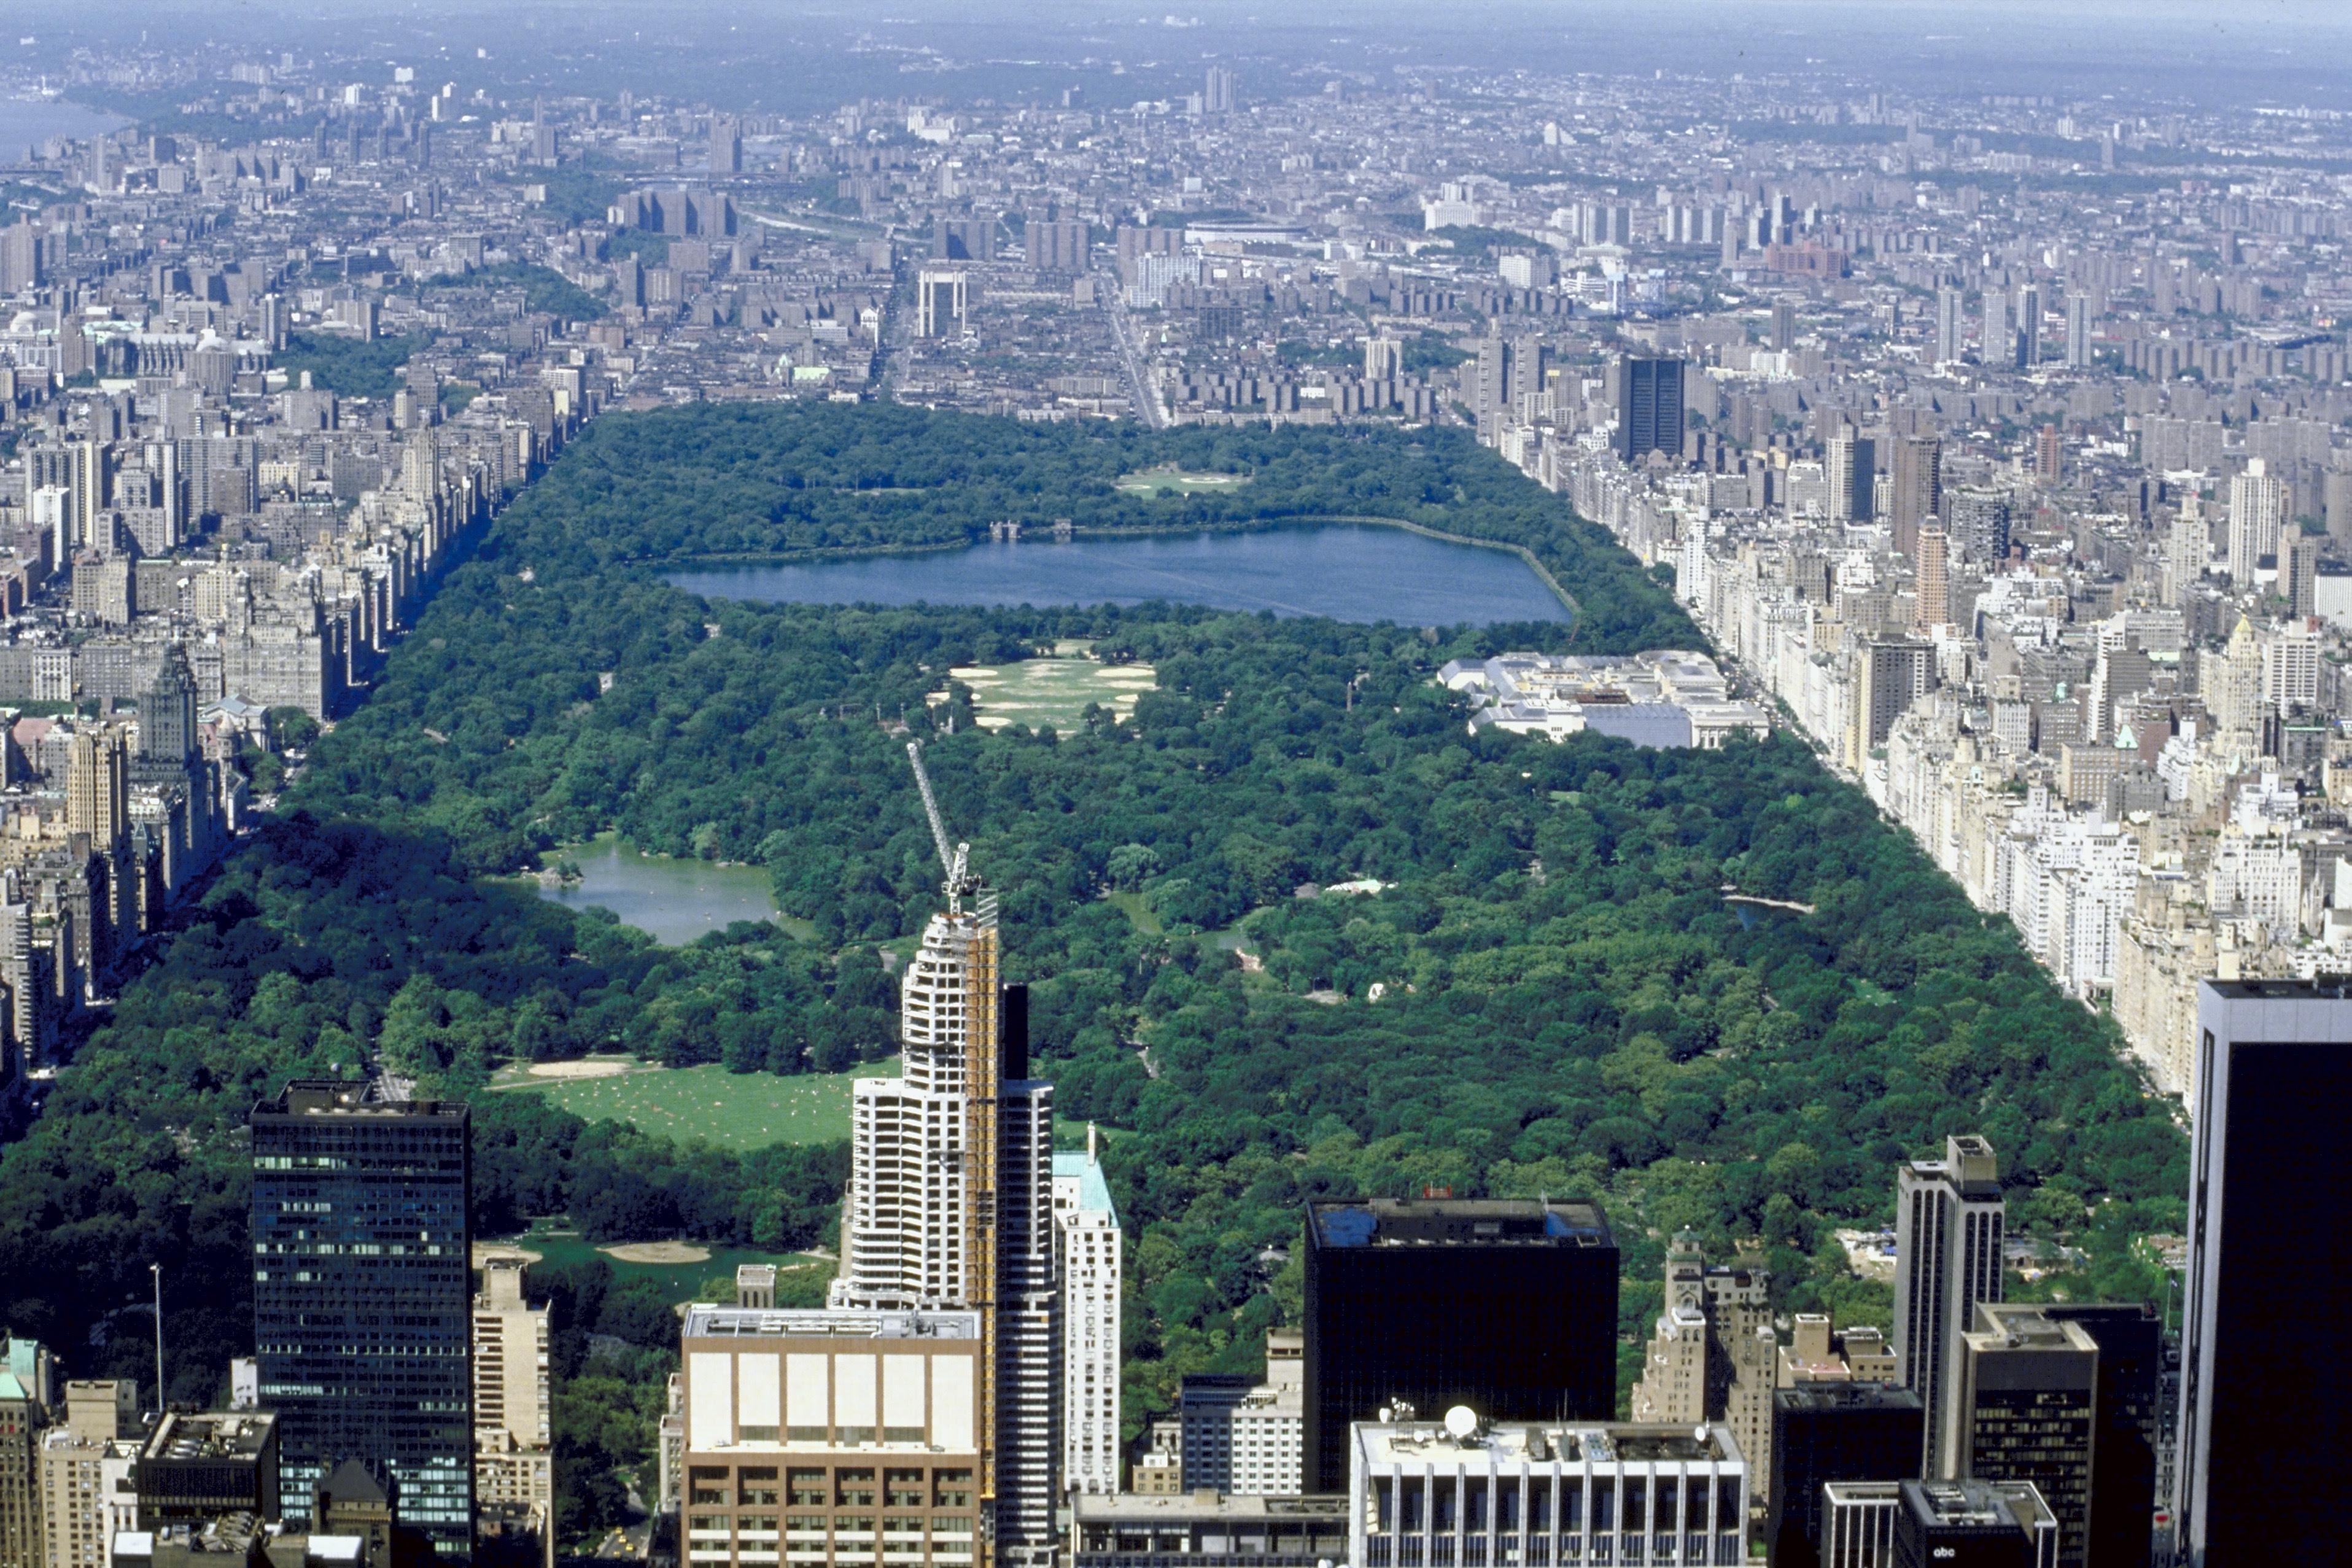 Central Park New York City USA1